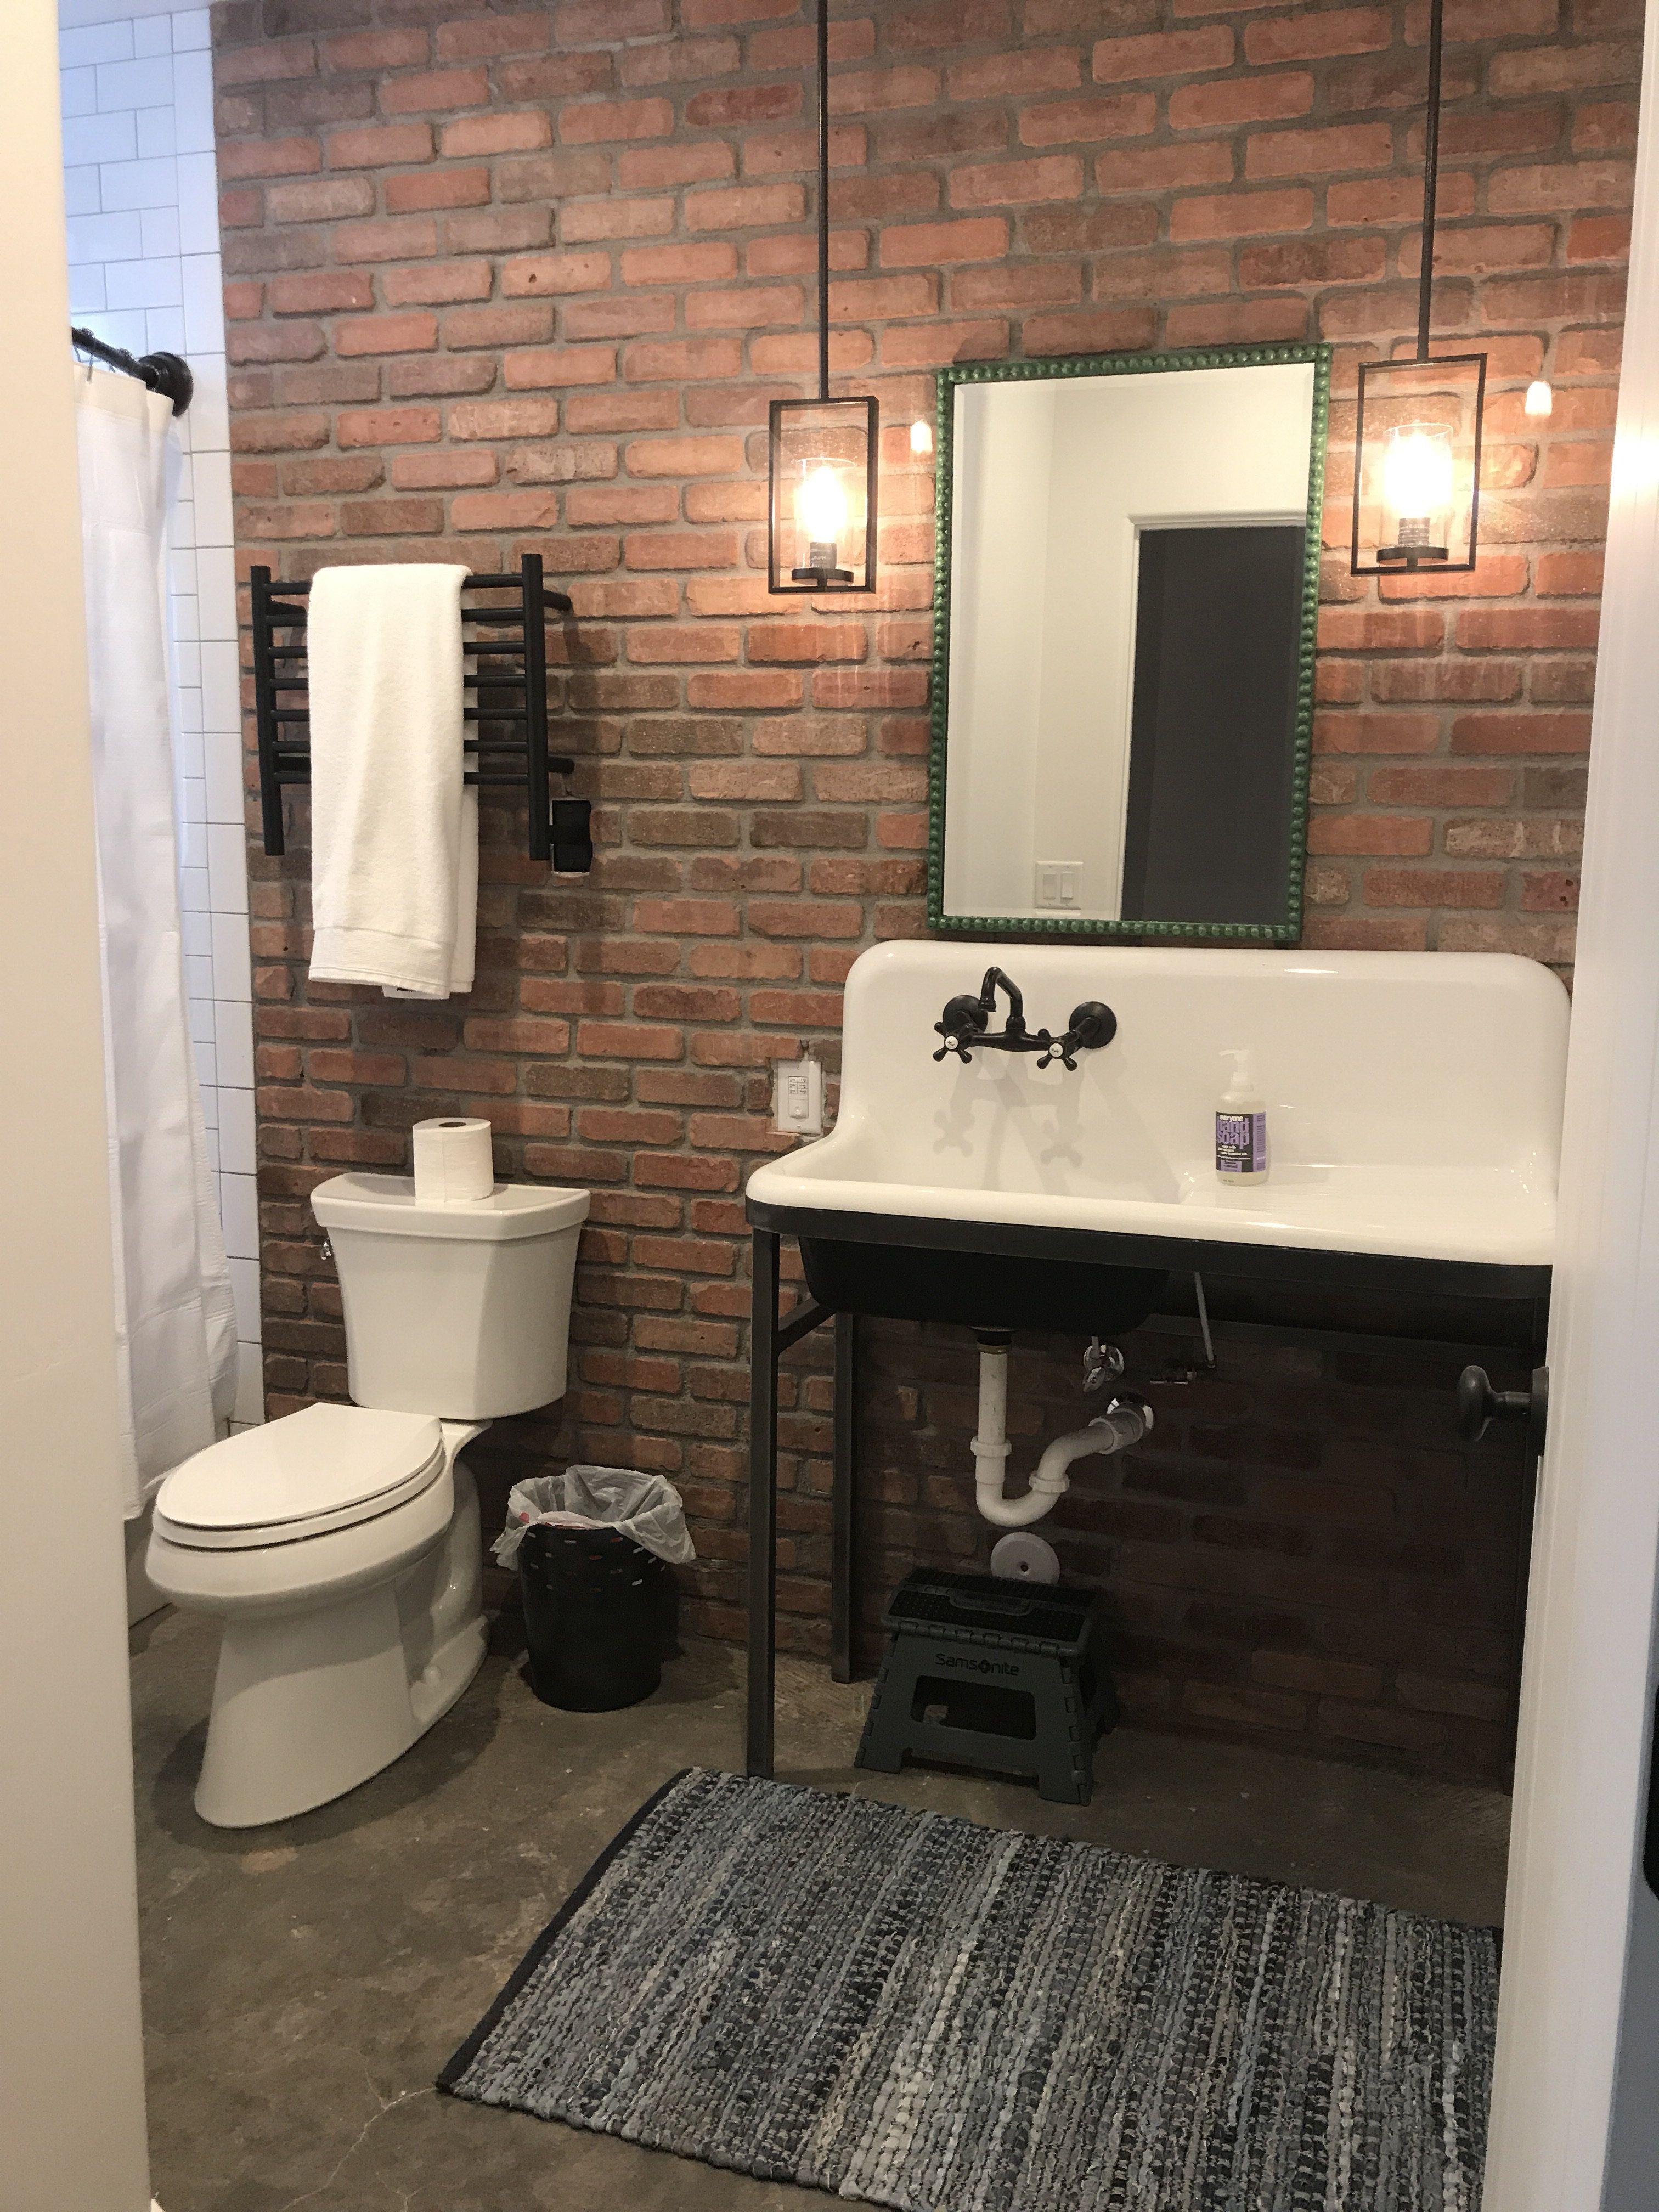 vintage inspired farmhouse drainboard sinks nbi drainboards installed in 2019 farmhouse on kitchen sink id=47854